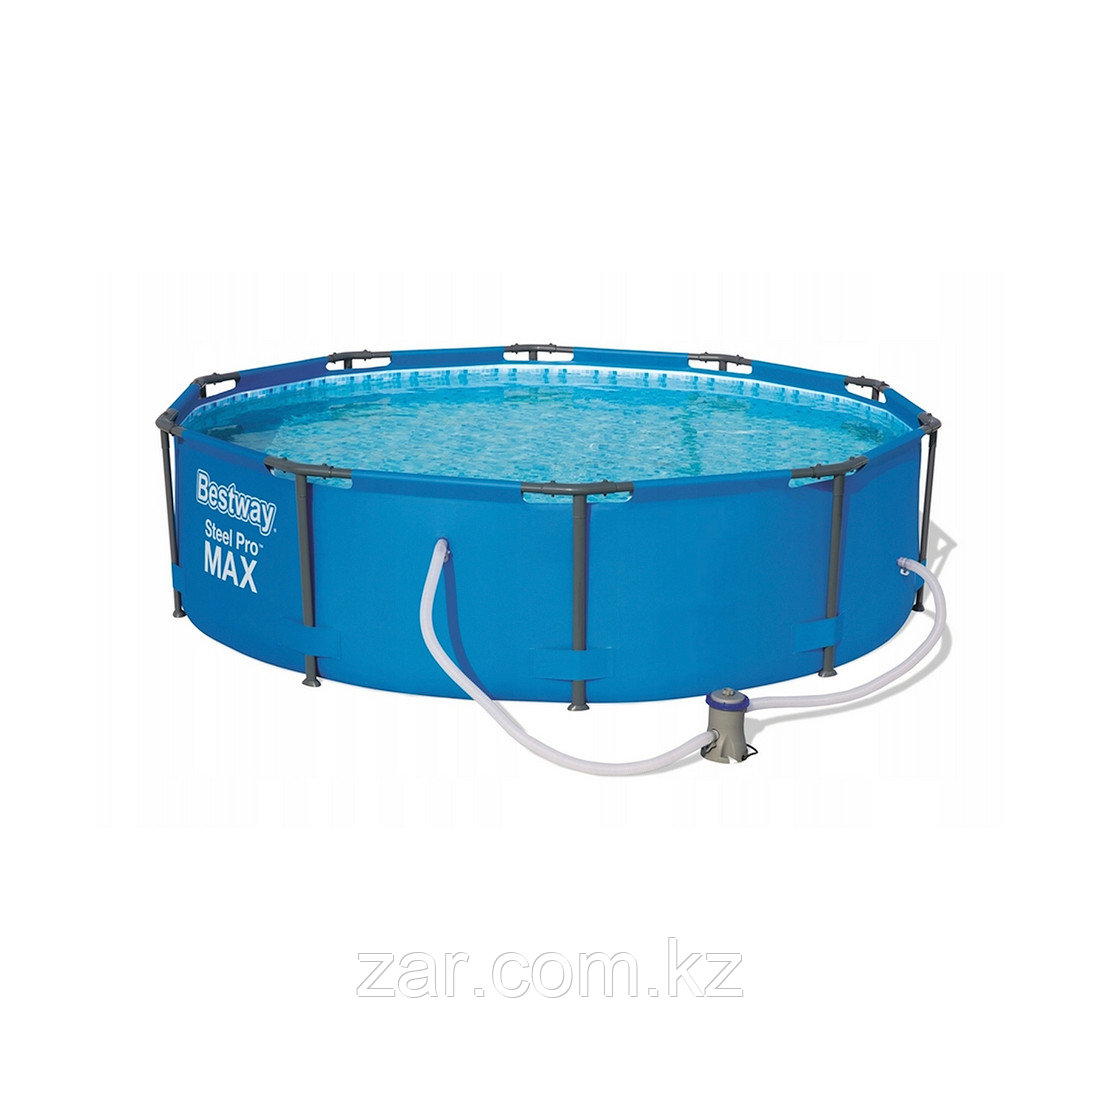 Каркасный бассейн Steel Pro MAX 305 х 100 см, BESTWAY14415 (56984)